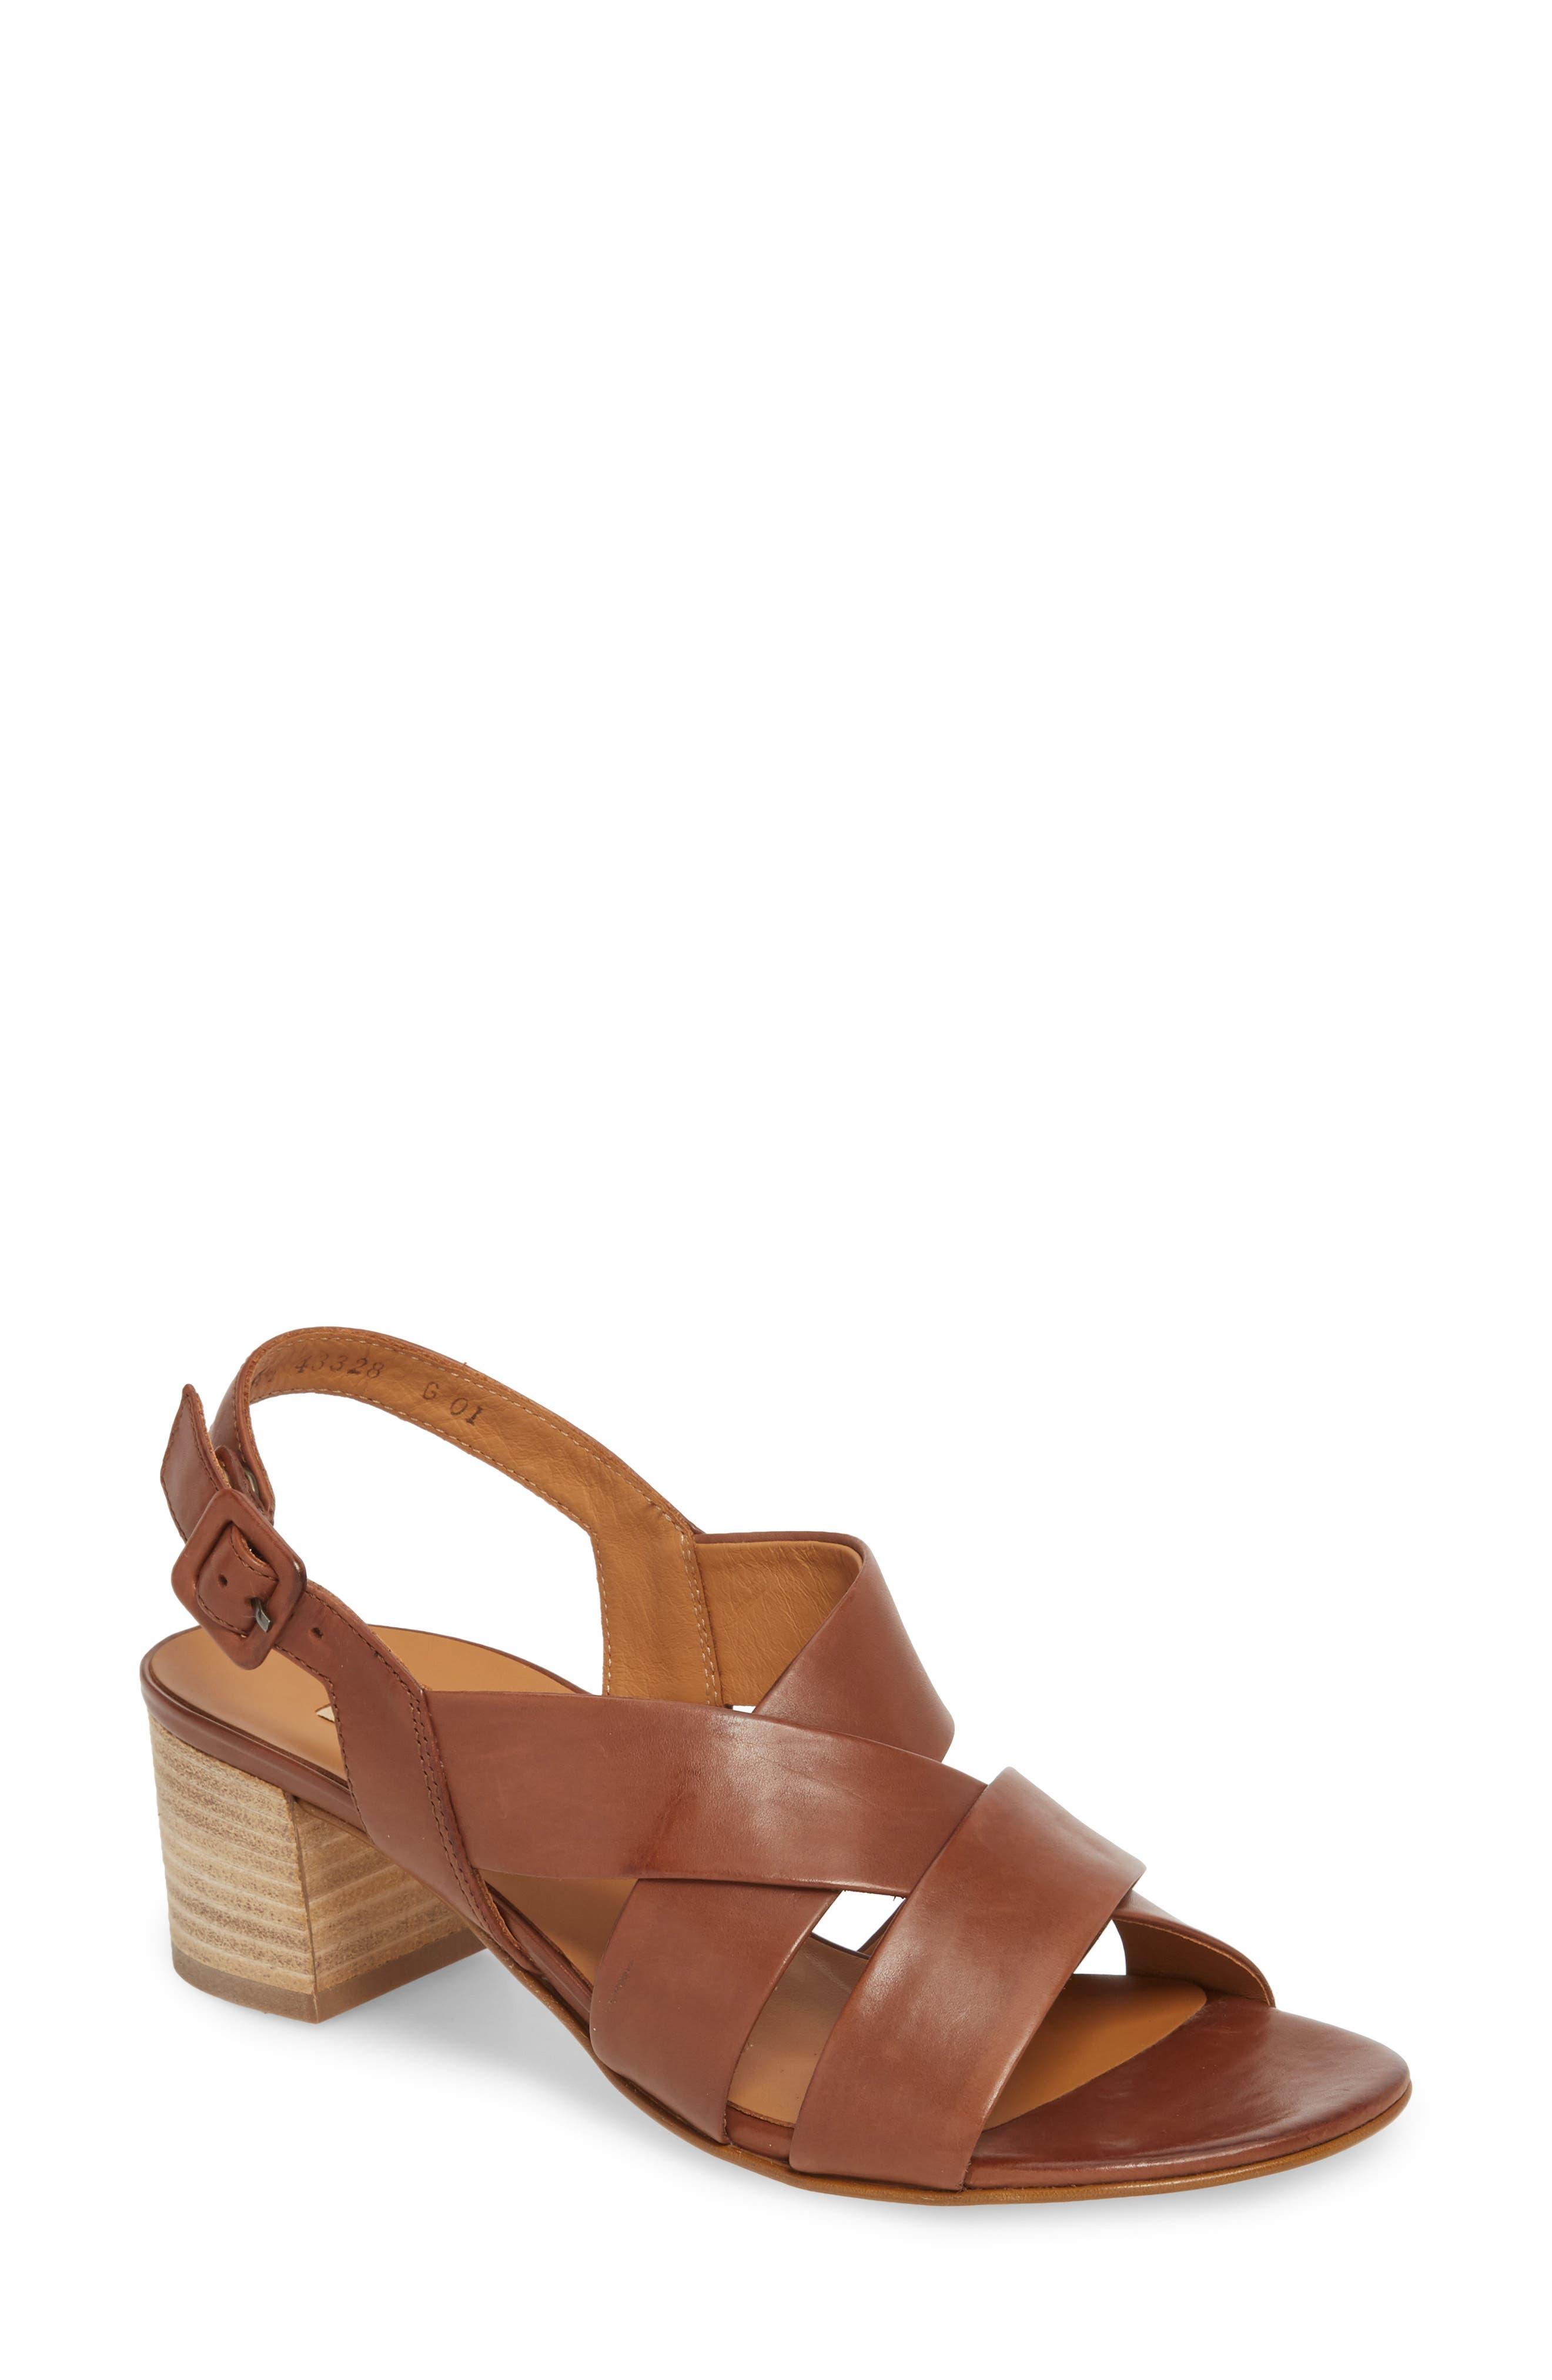 Reese Slingback Sandal,                         Main,                         color, Nougat Leather